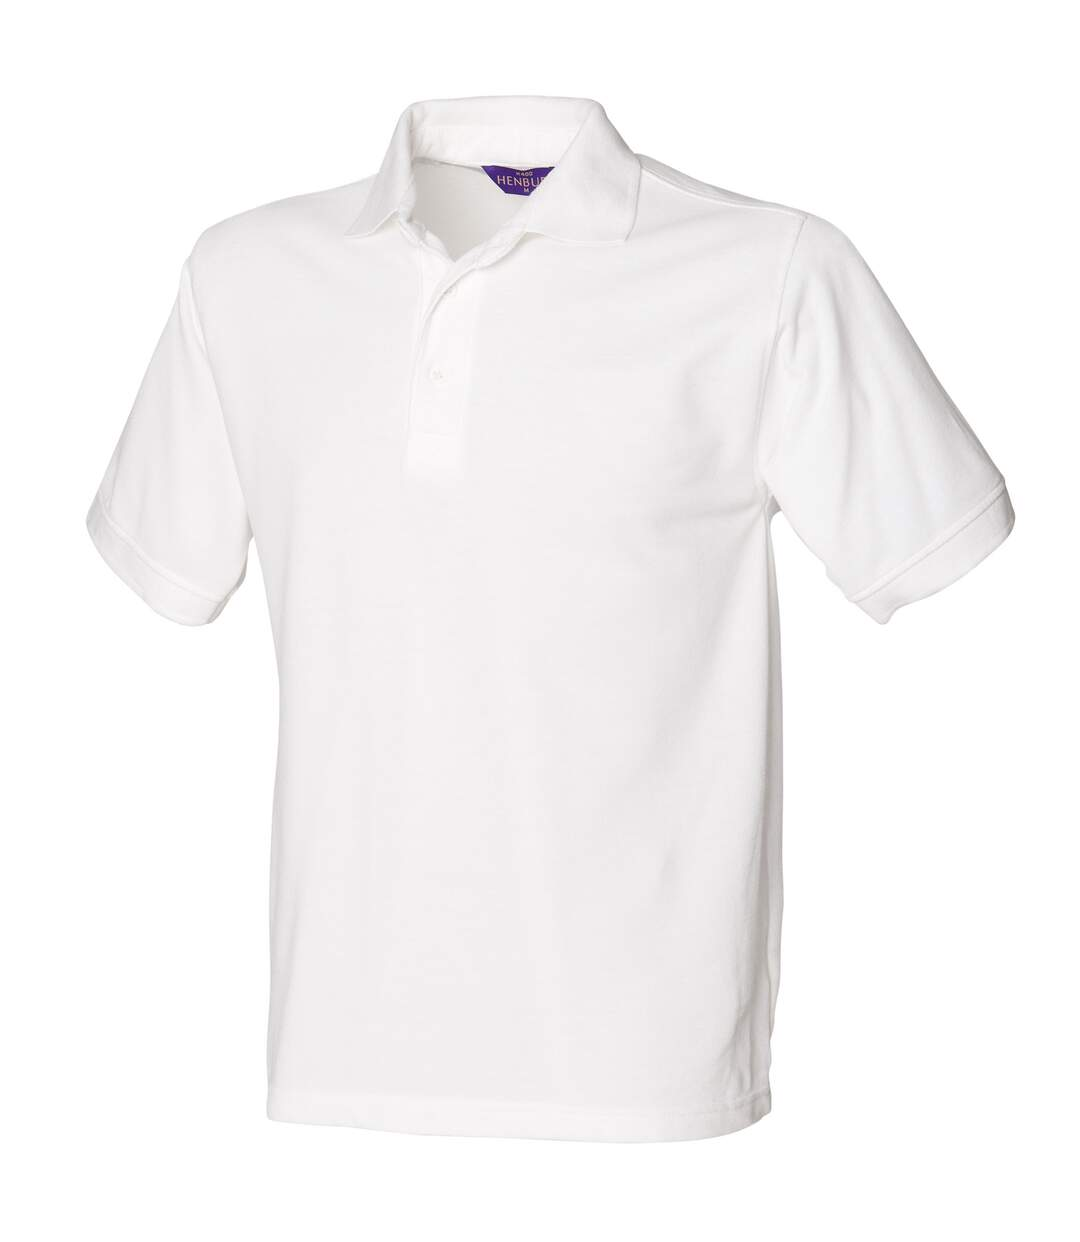 Henbury Mens Short Sleeved 65/35 Pique Polo Shirt (Turquoise) - UTRW625